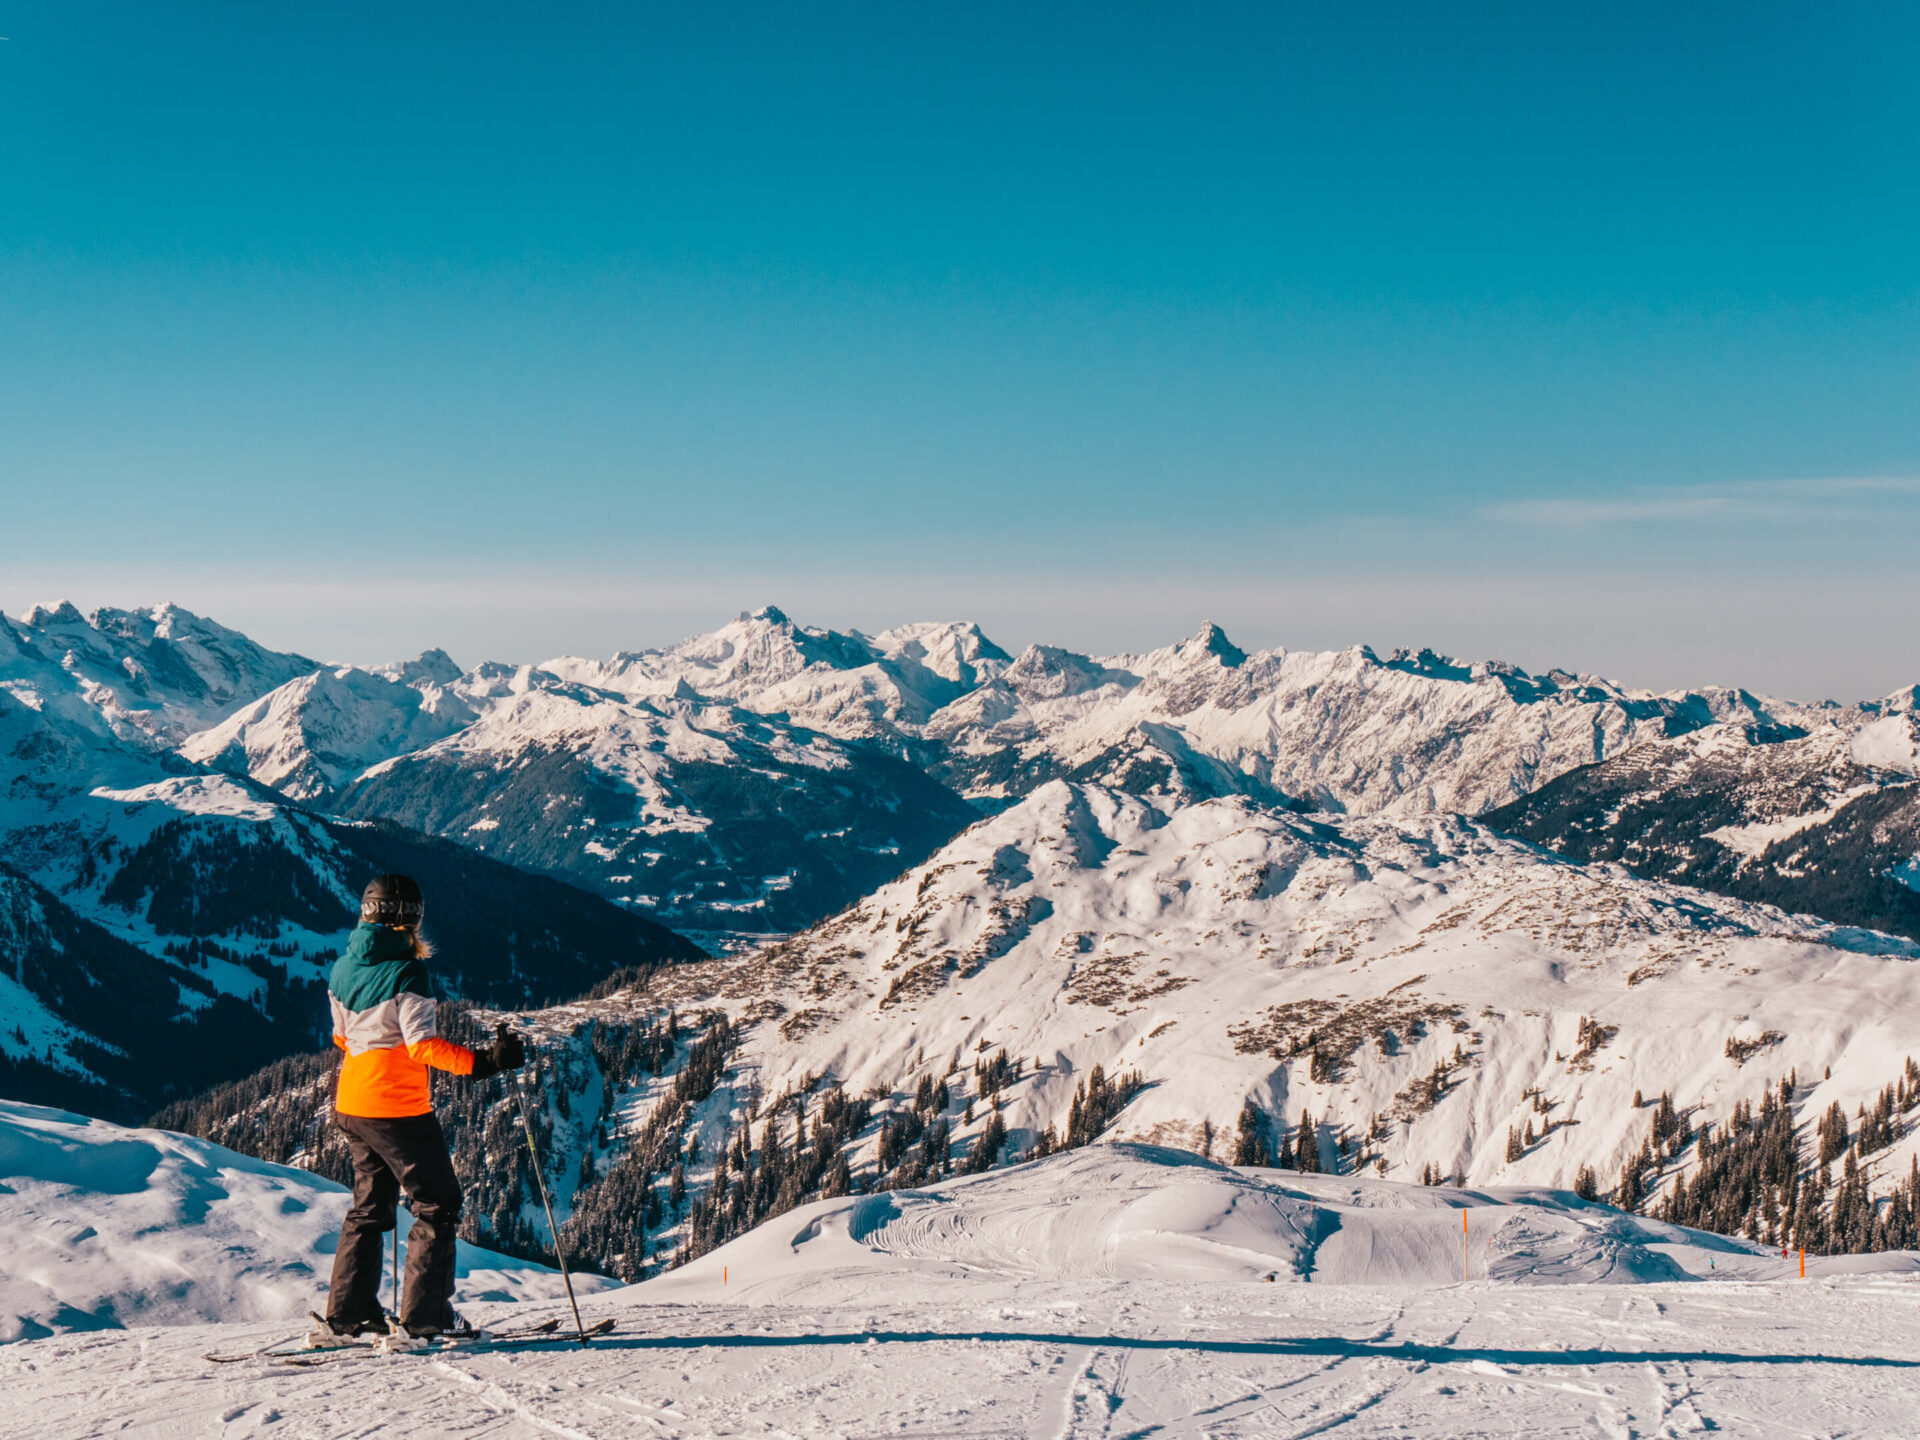 vorarlberg sonnenkopf arlberg klostertal piste ski-fahren berge frau panorama